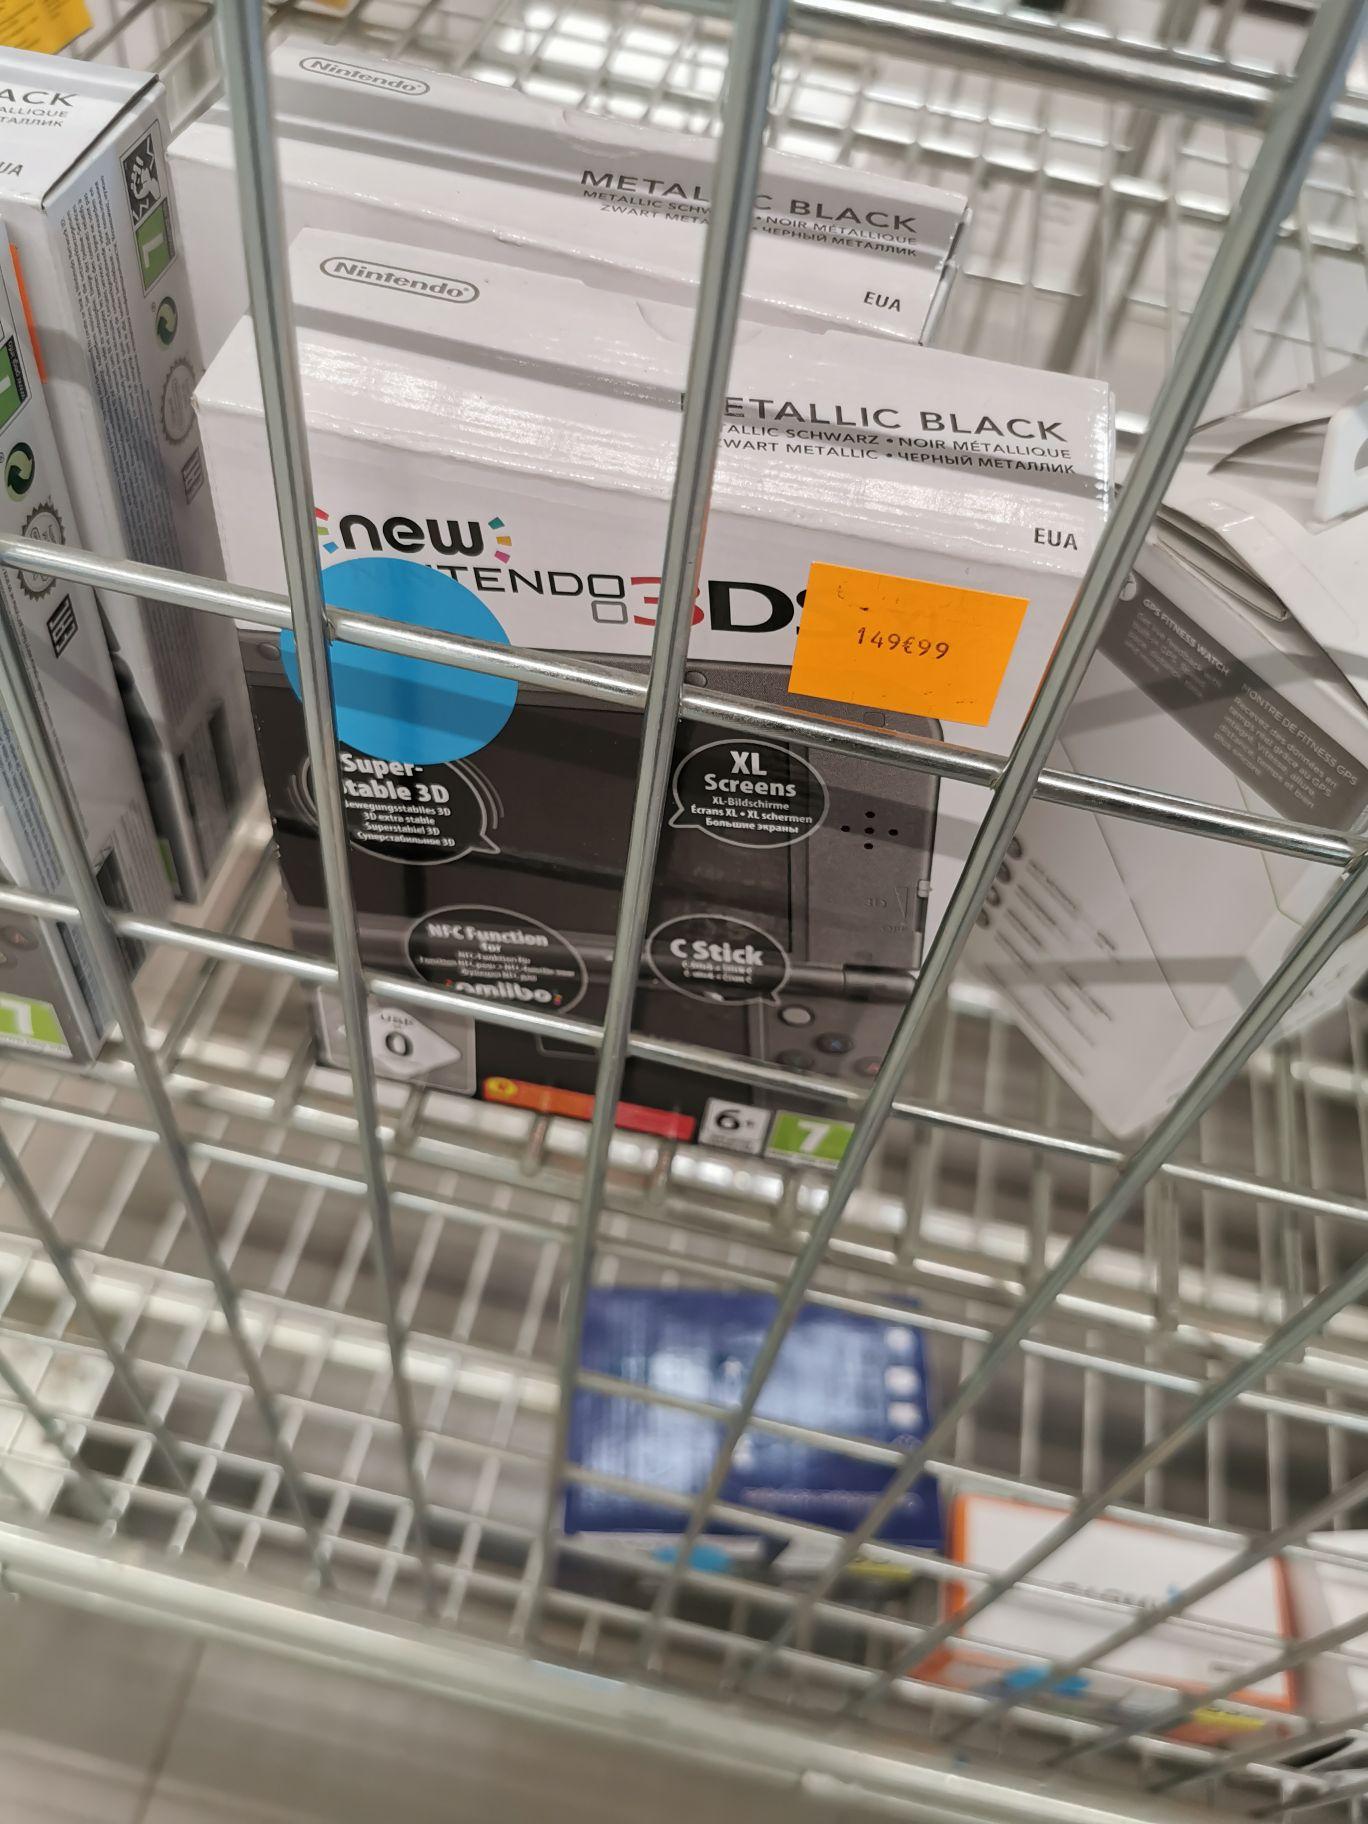 Console Nintendo New 3DS XL (Pearl White ou Metallic Black) - Souppes-sur-Loing (77)